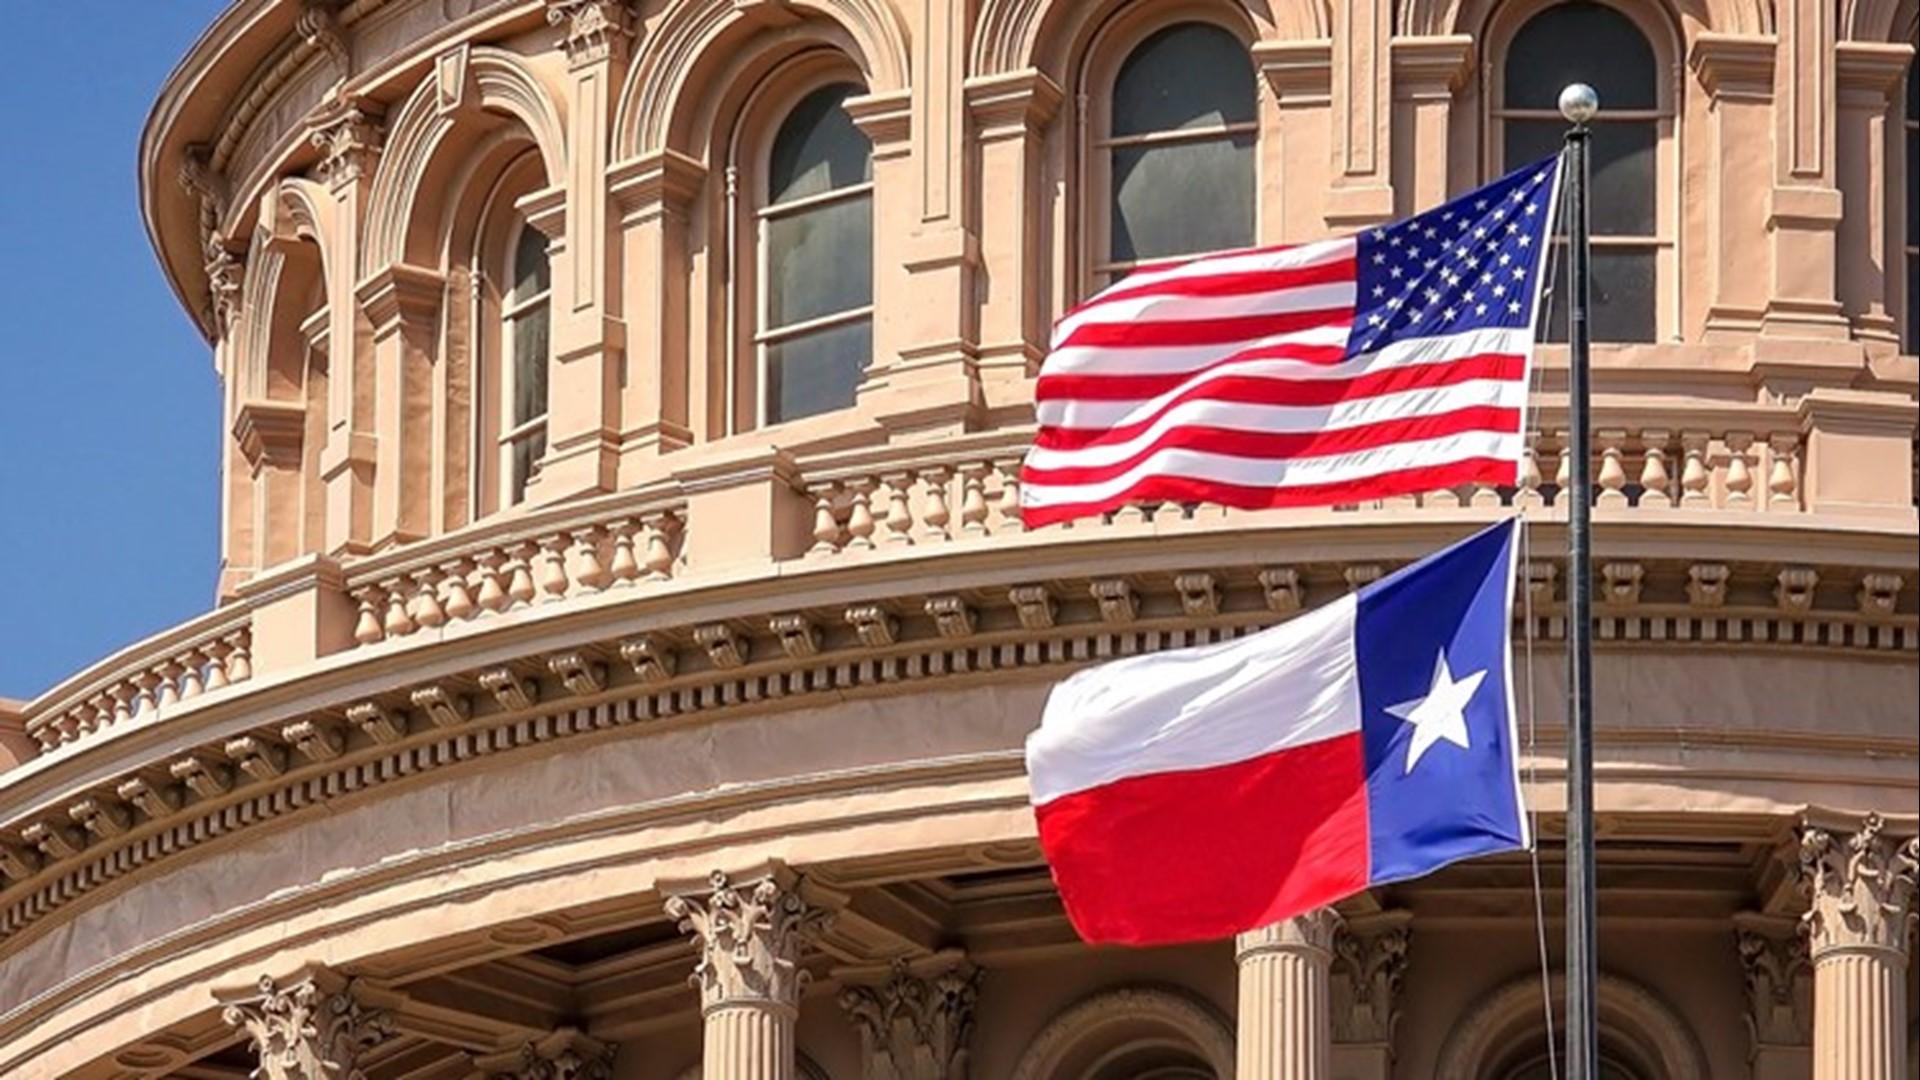 Texas Liquor Laws Christmas 2020 These new Texas laws go into effect January 1, 2020 | khou.com